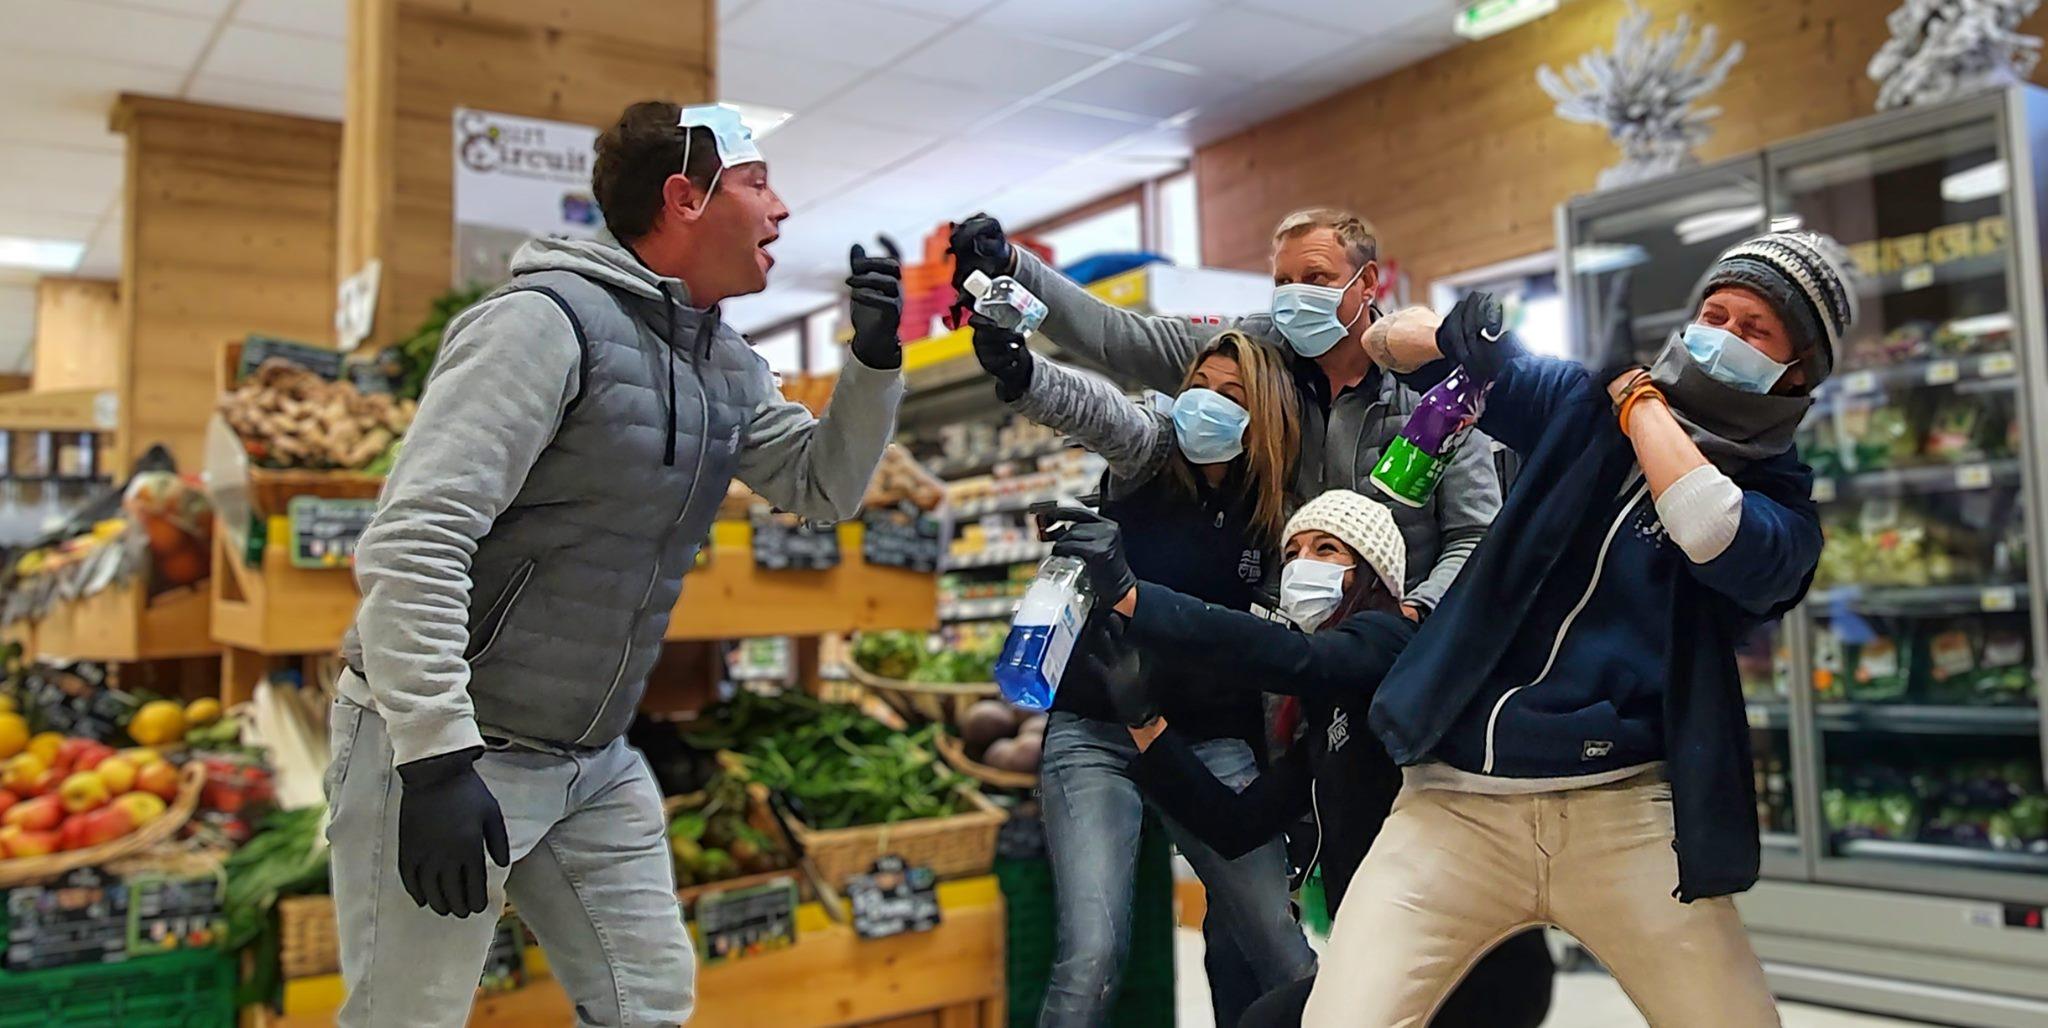 Sherpa alimentation - supermarché sur isola